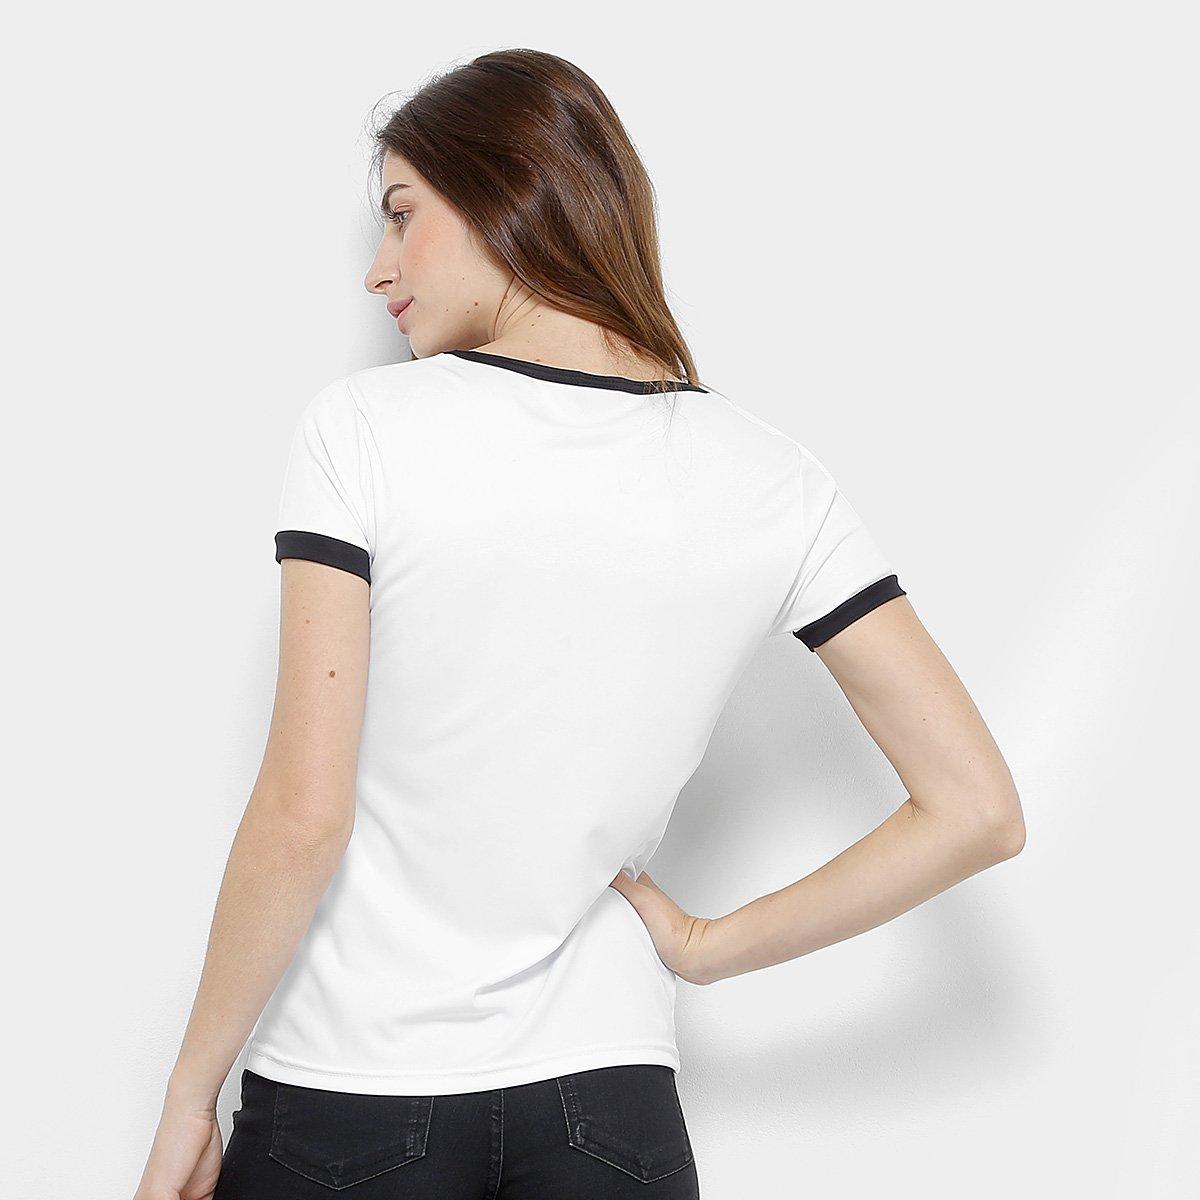 Camiseta Corinthians Basic Feminina  Camiseta Corinthians Basic Feminina ... 8b44718a2a51b